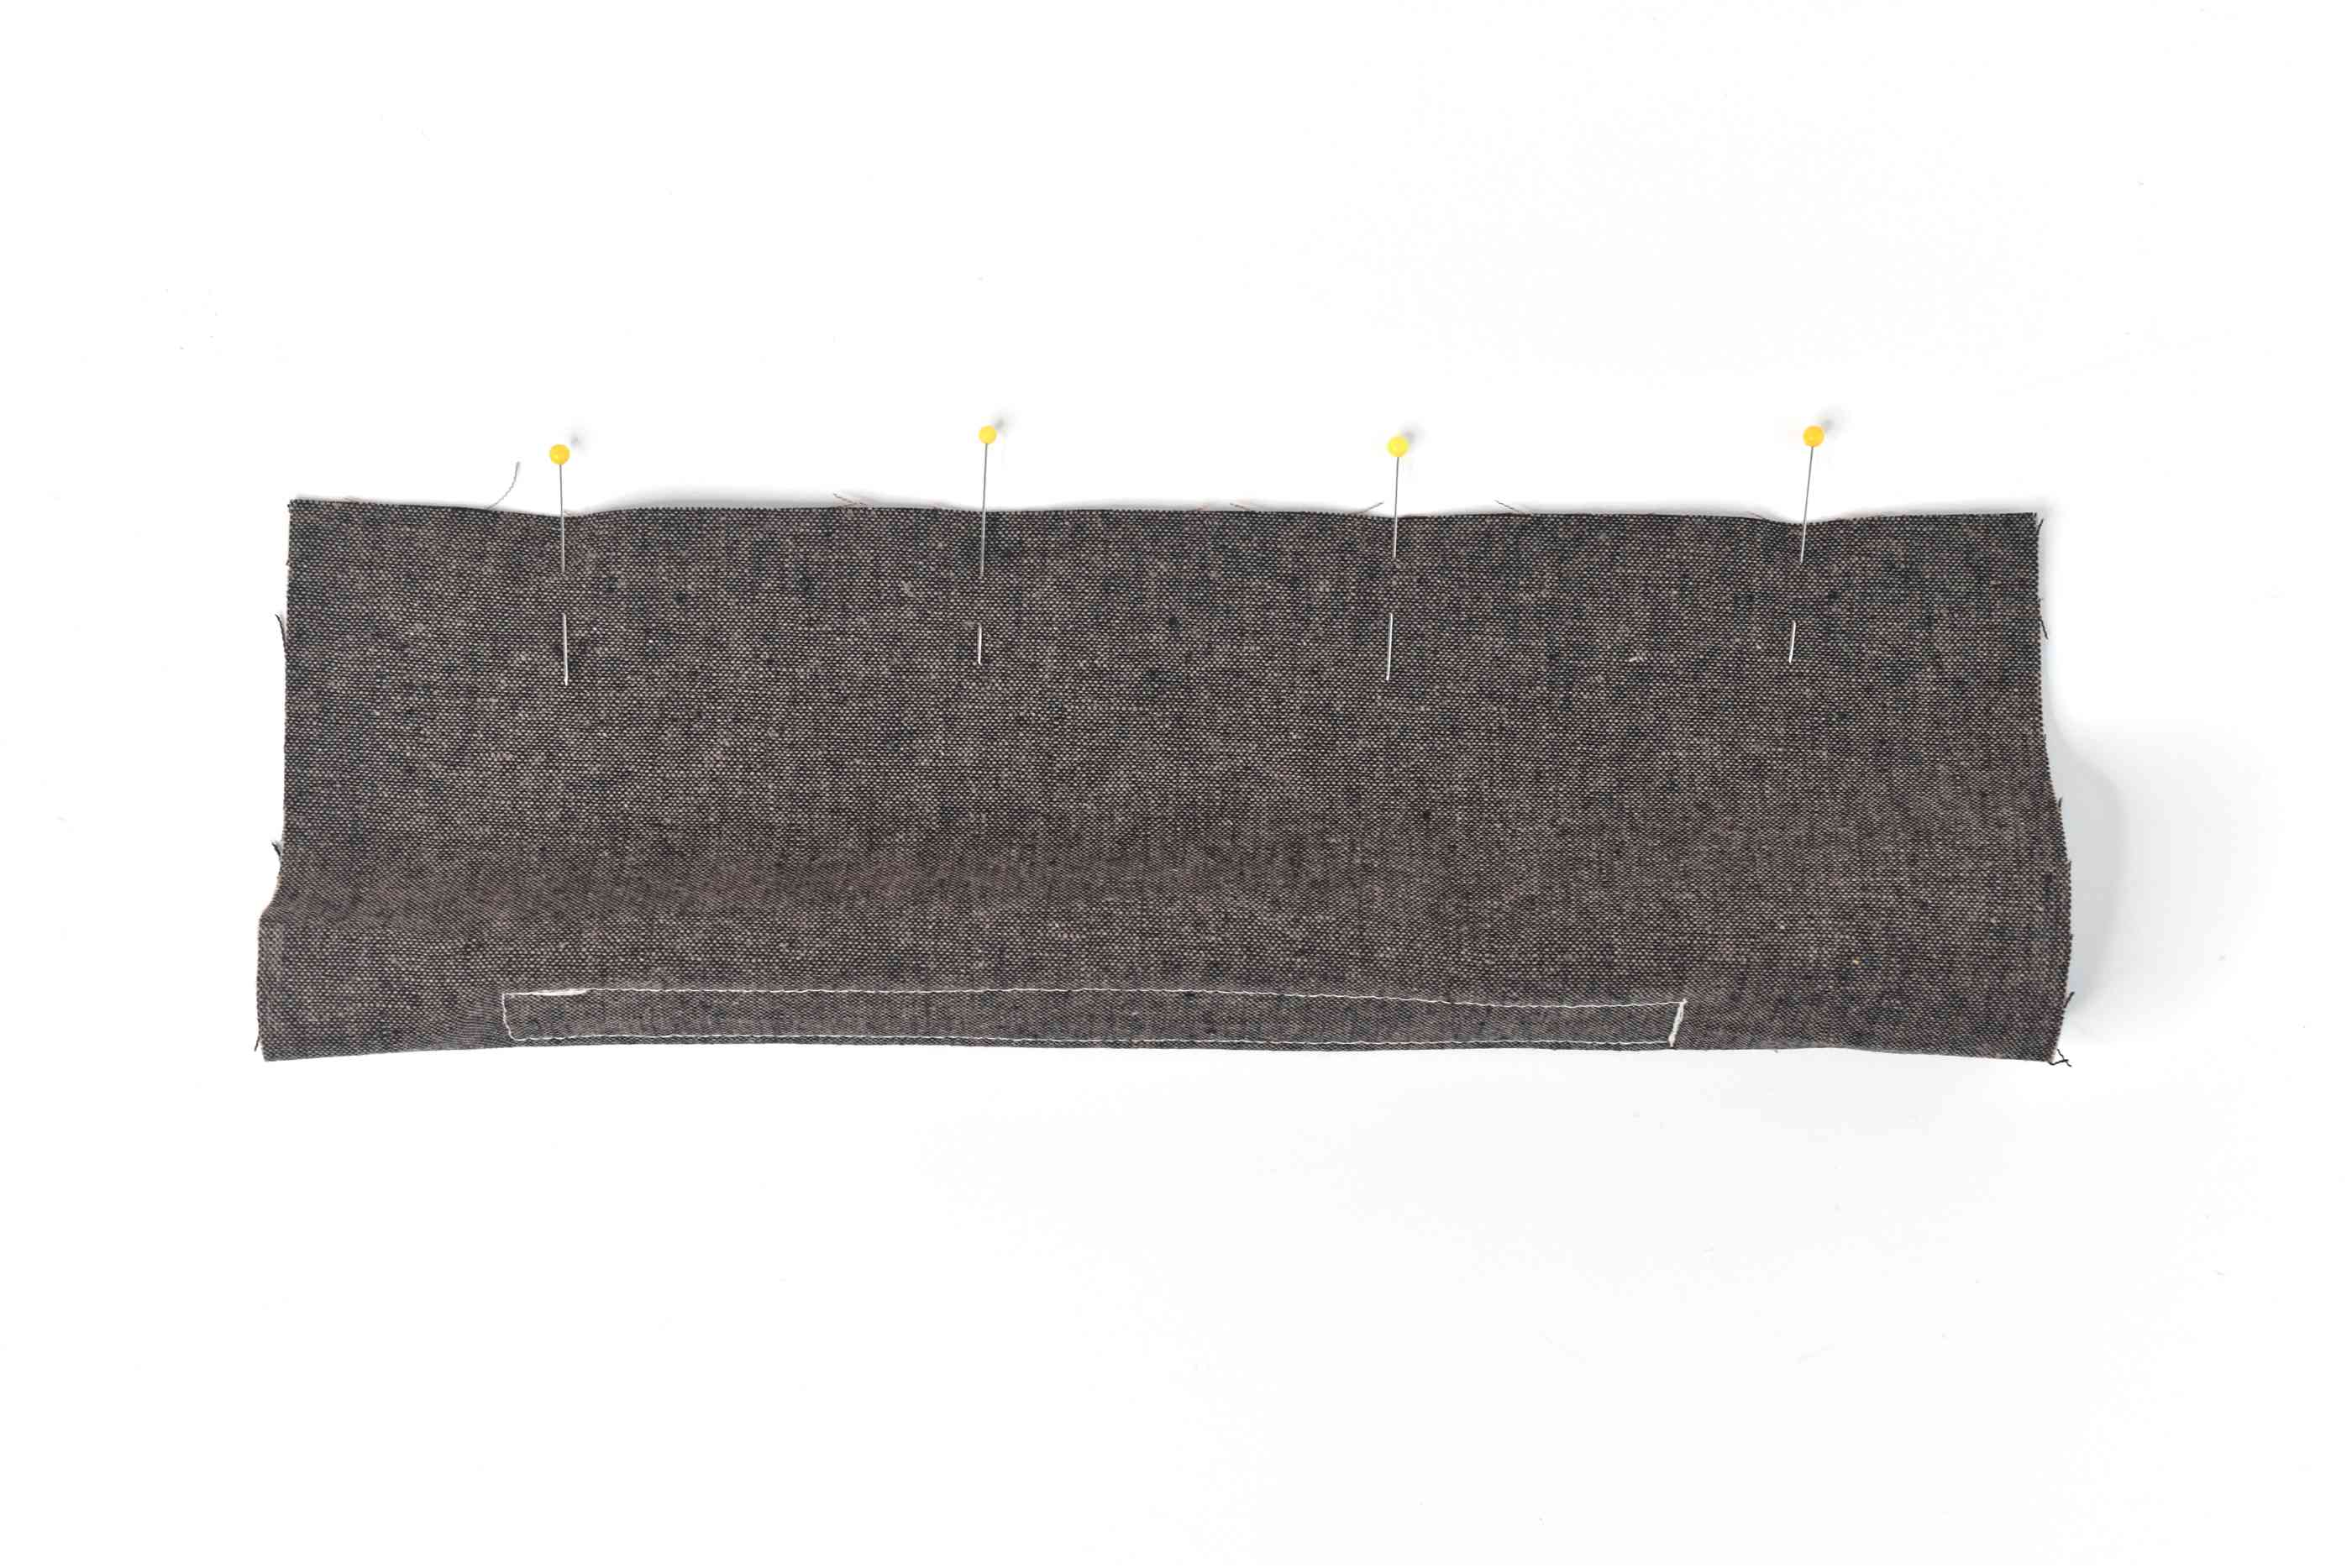 Sew the Fabric Into a Tube Shape